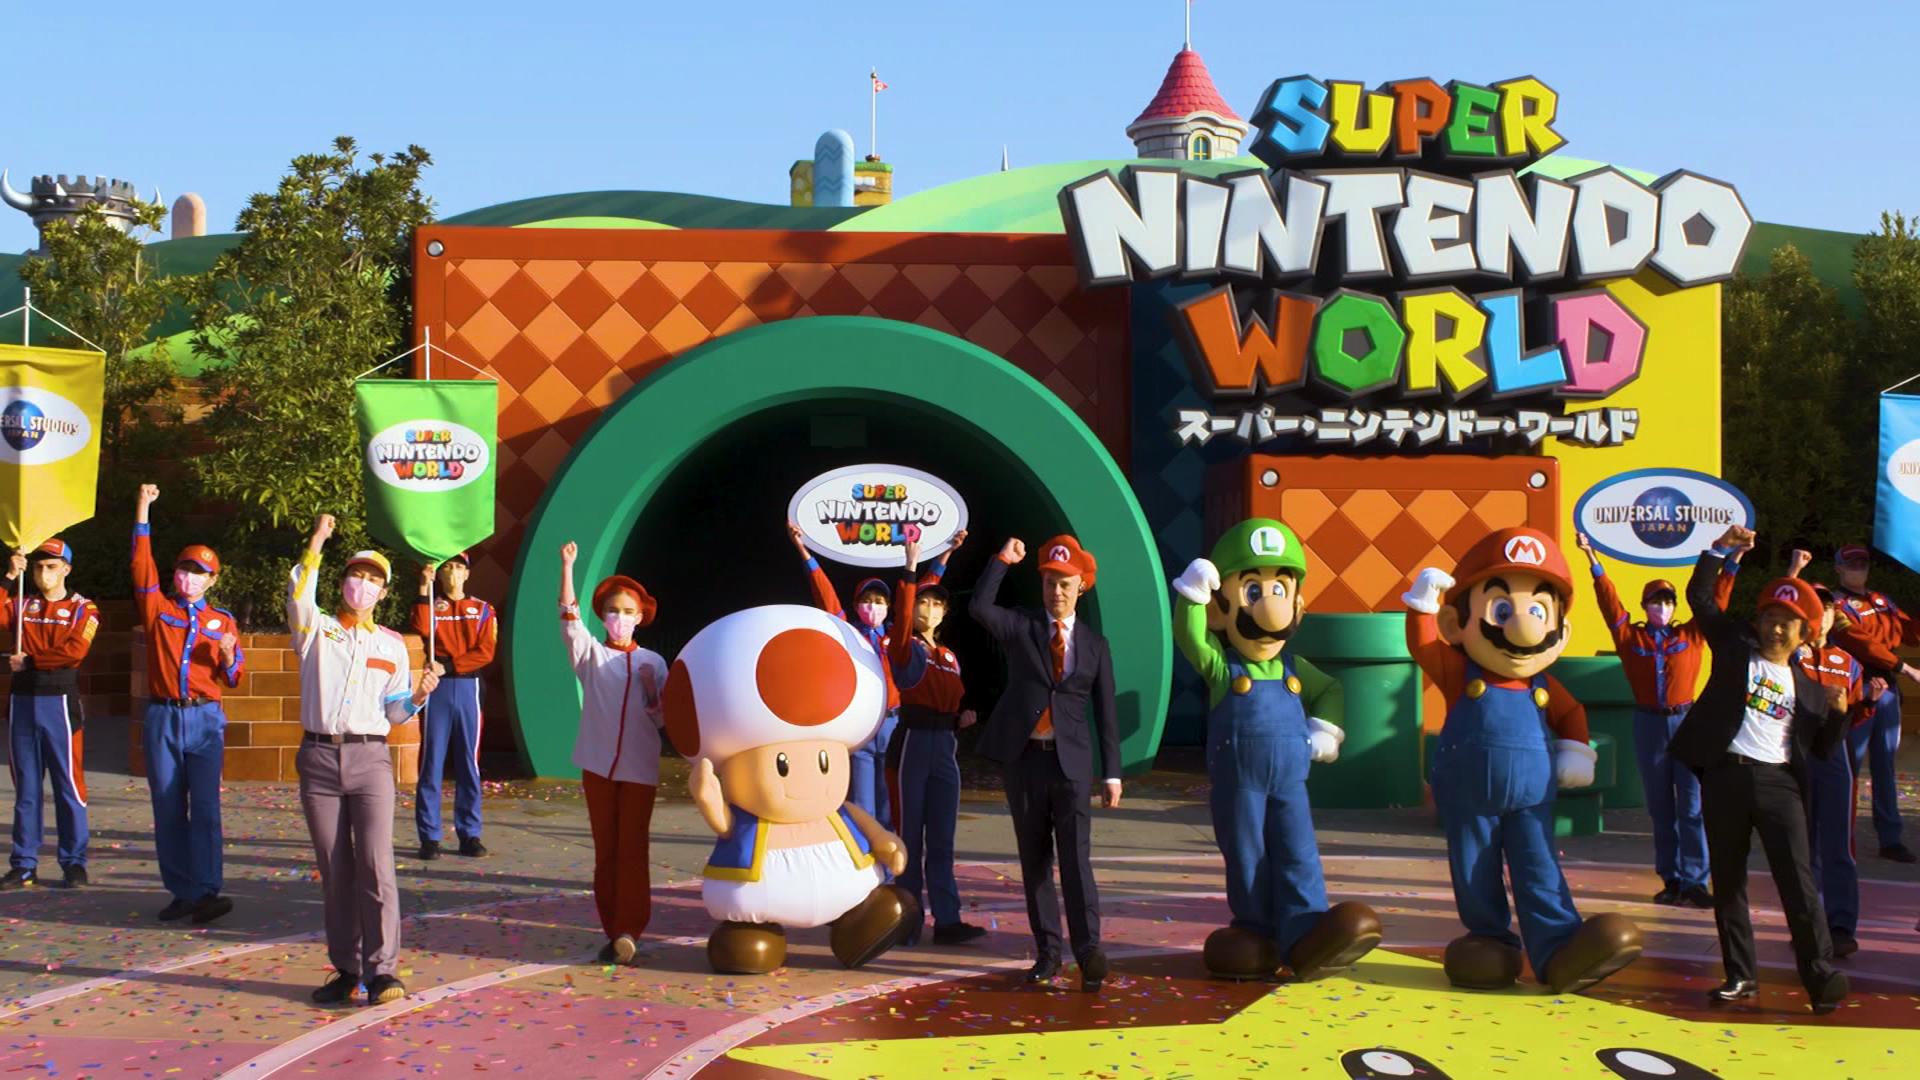 Super Nintendo World opens at Universal Studios Japan | CNN Travel